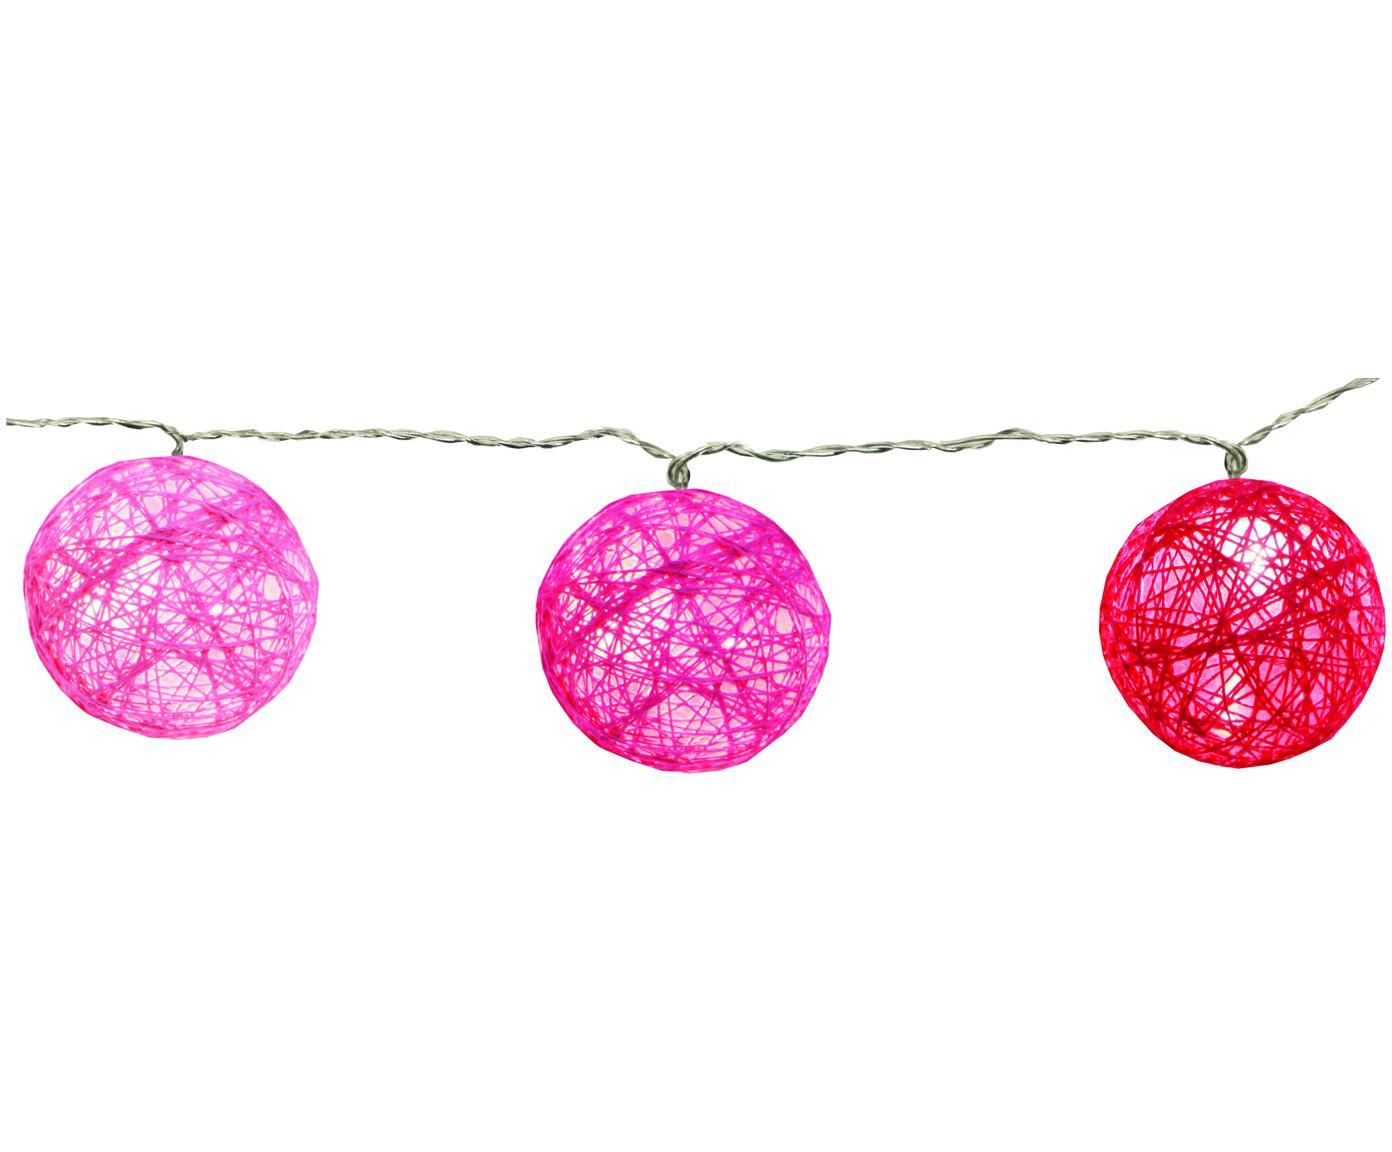 Girlanda świetlna LED Jolly Lights, 135 cm, Różowy, D 135 cm